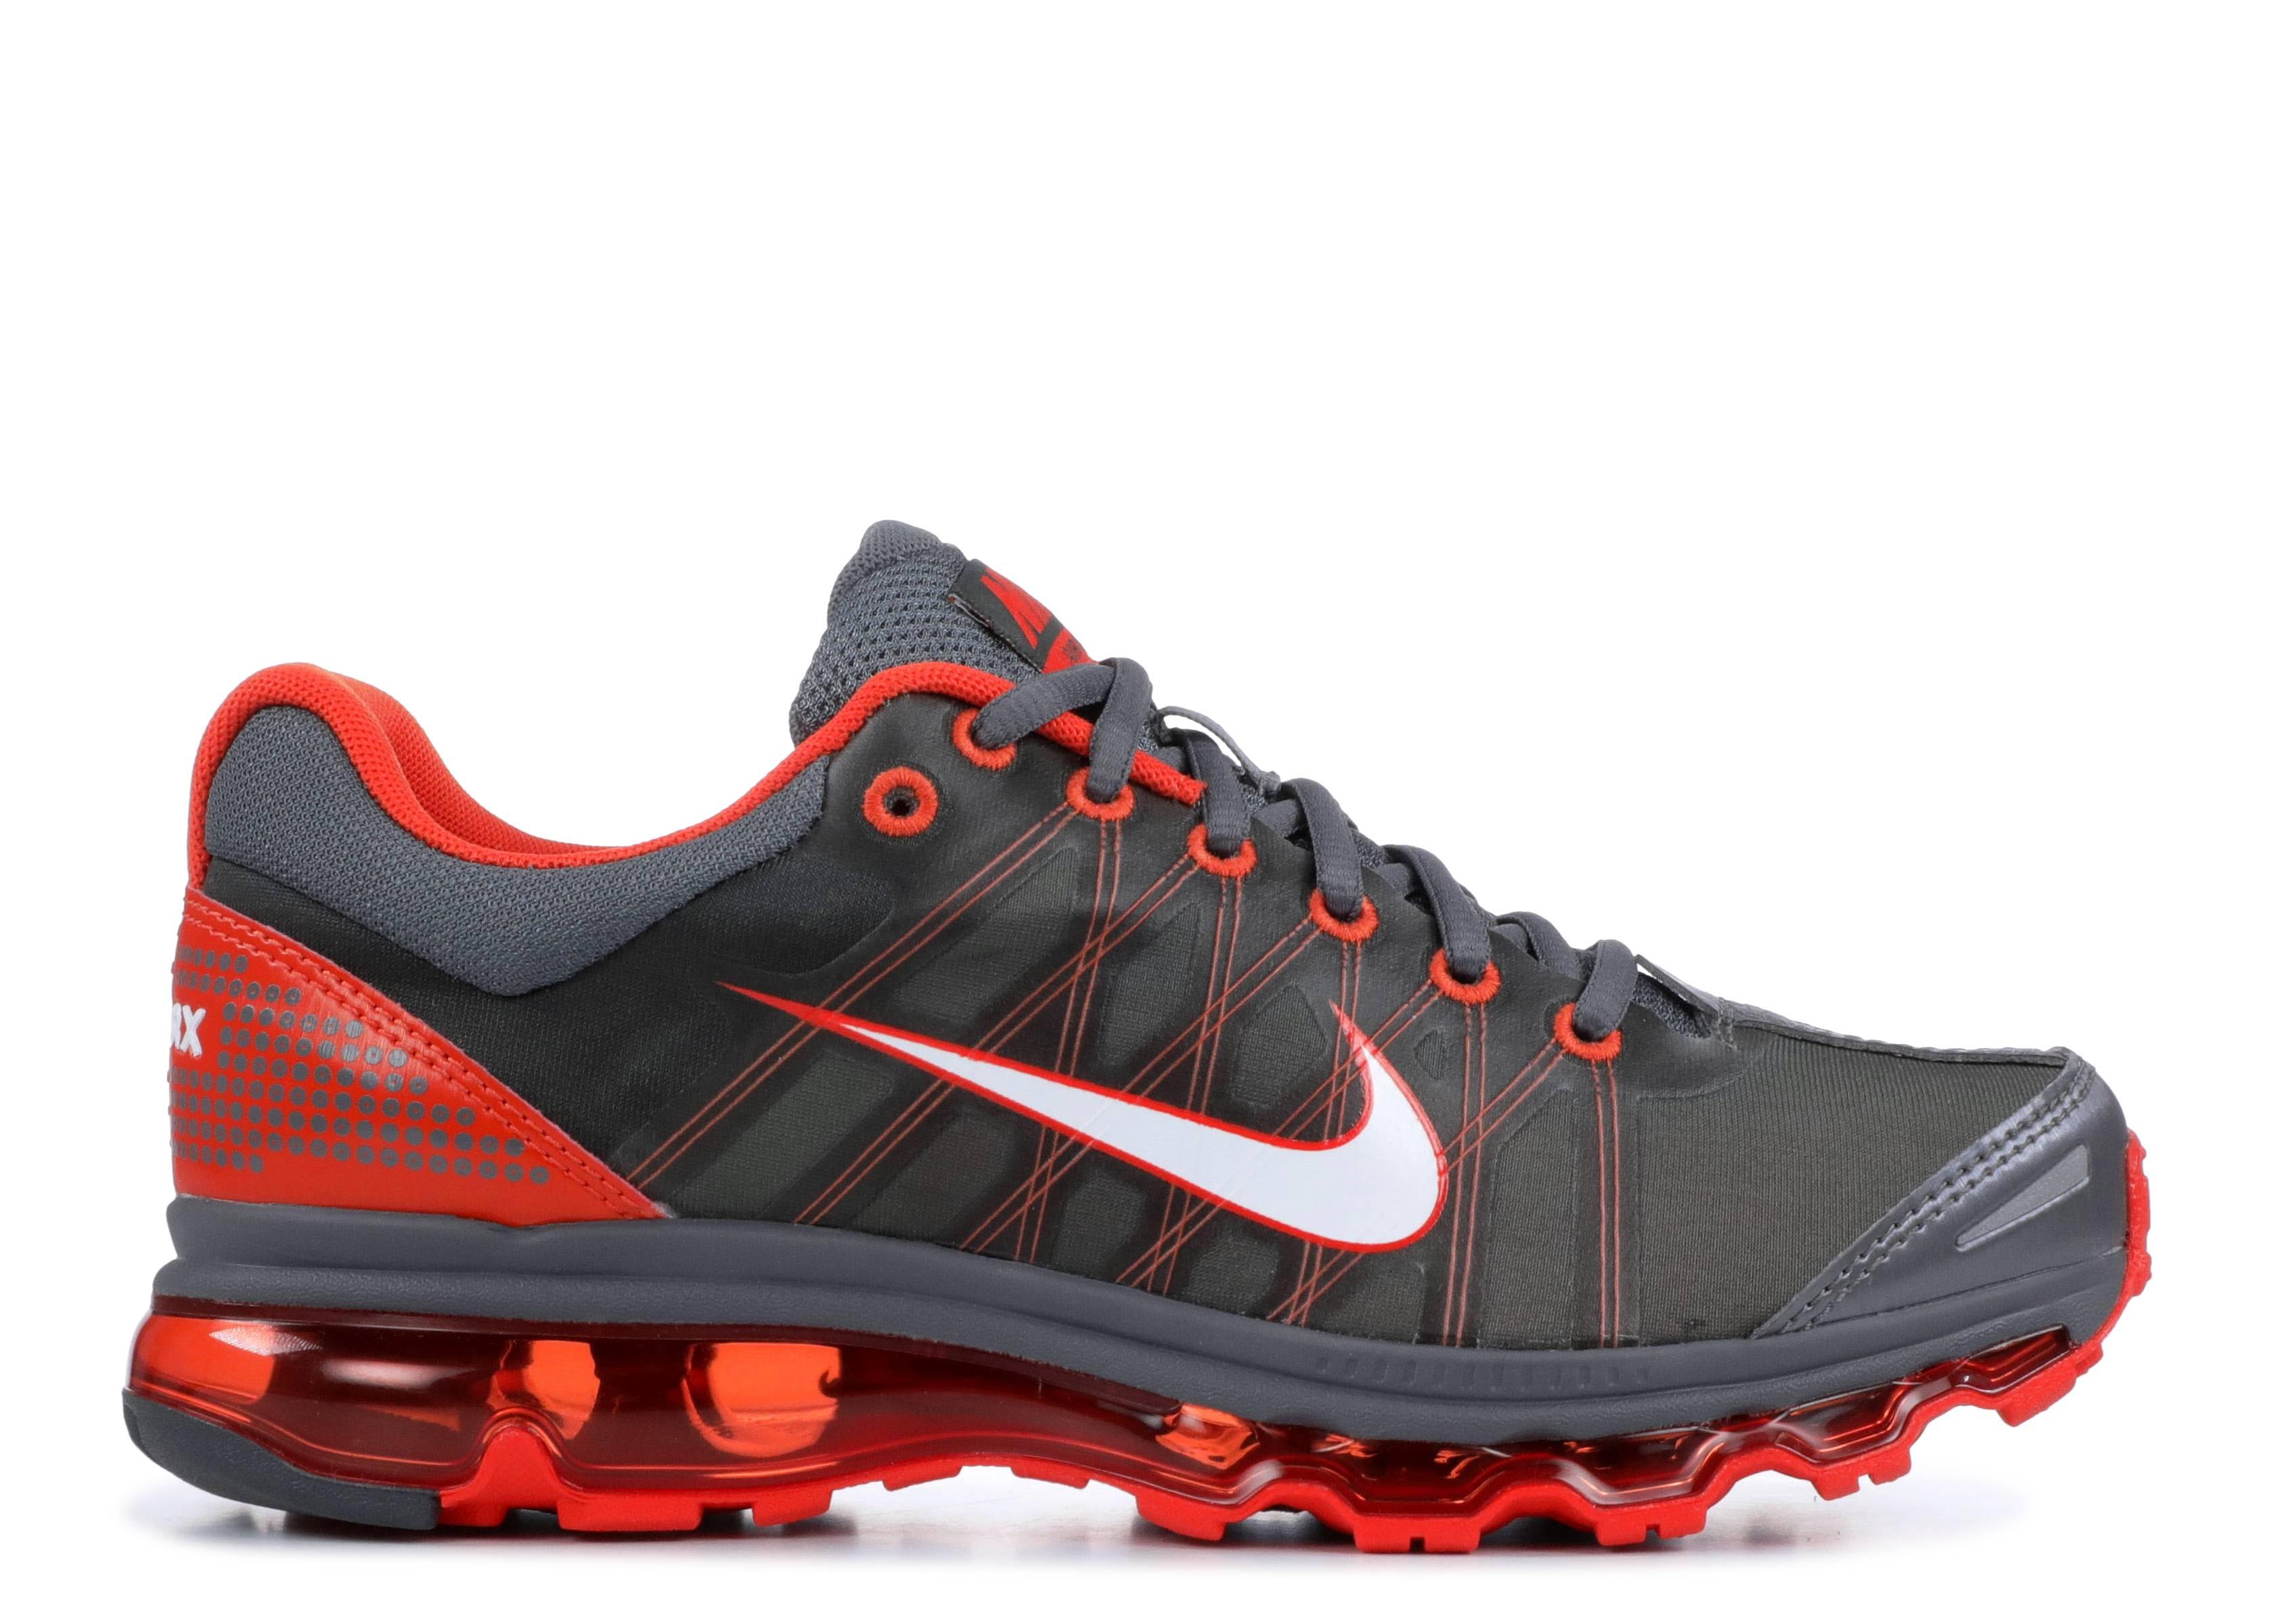 brand new 4c2d9 af22d Air Max 2009 - Nike - 486978 018 - dark grey white-vivid orange ...